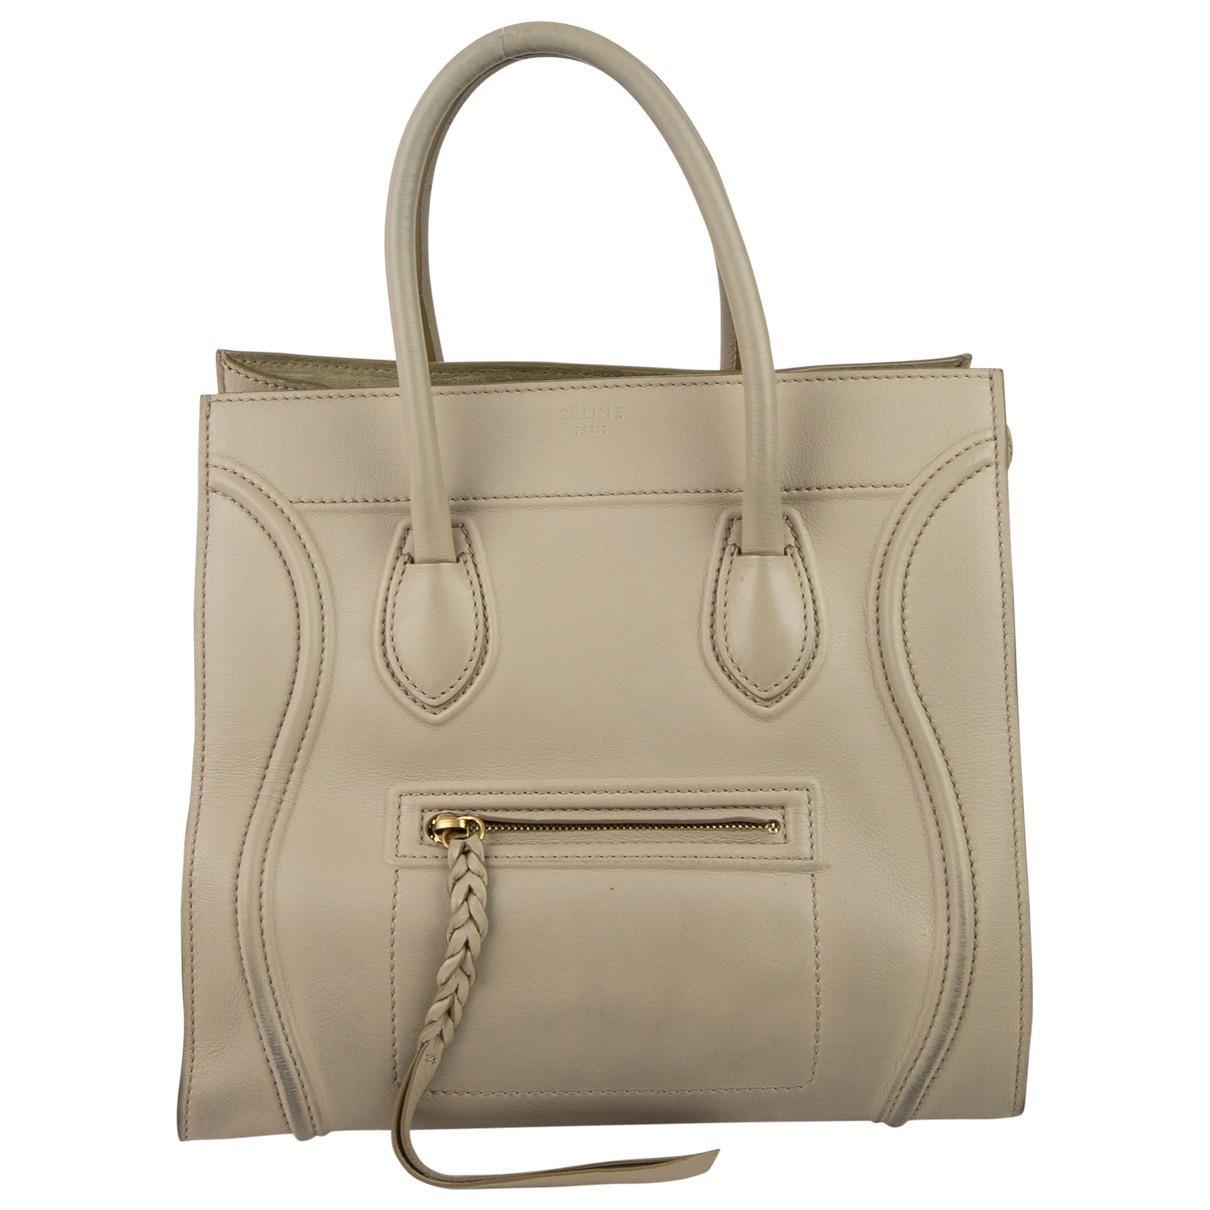 8faffb57eb Céline Luggage Phantom Leather Handbag in Natural - Save ...